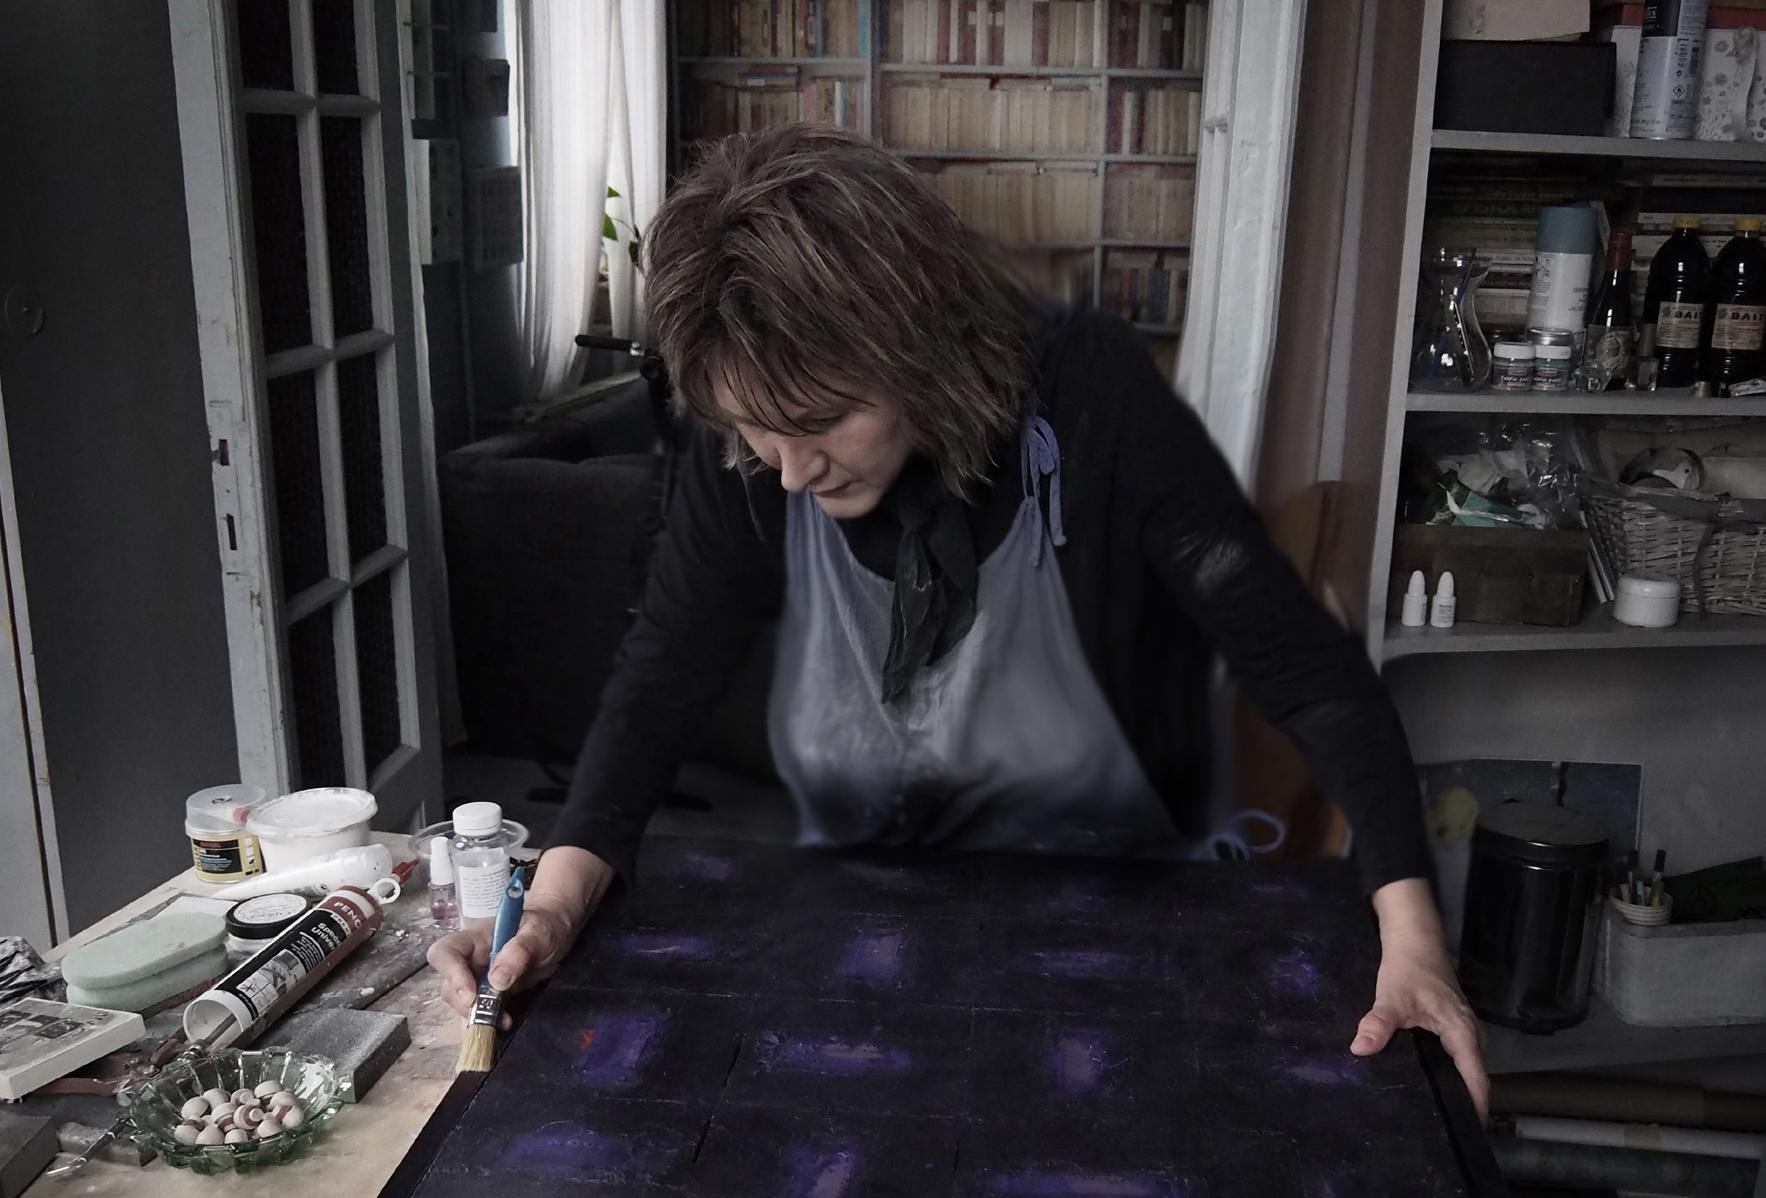 Ana-Maria Panaitescu - visiting artist's studio